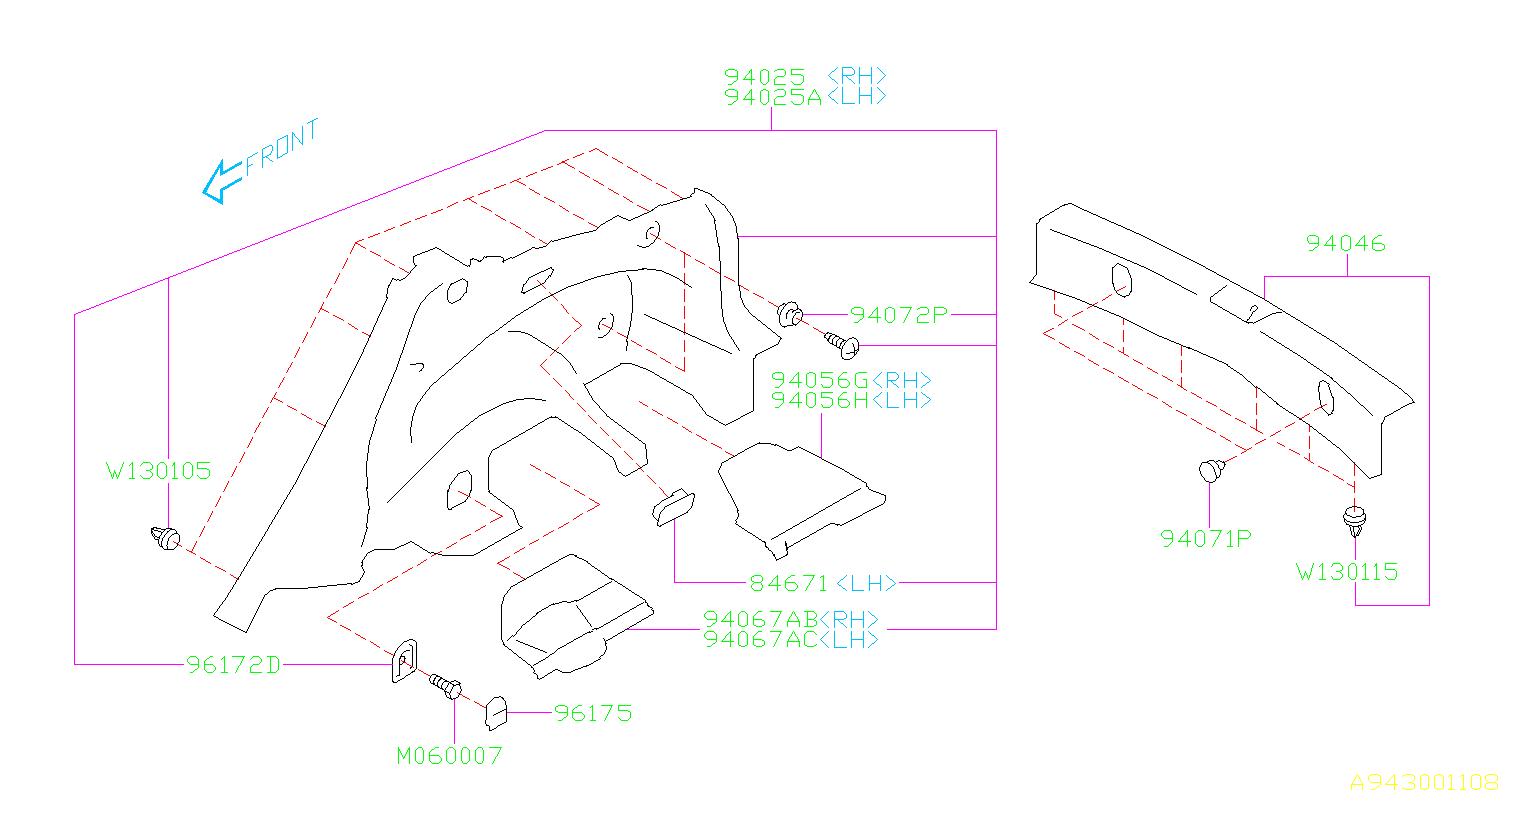 hight resolution of subary crosstrek fuse box 25 wiring diagram images